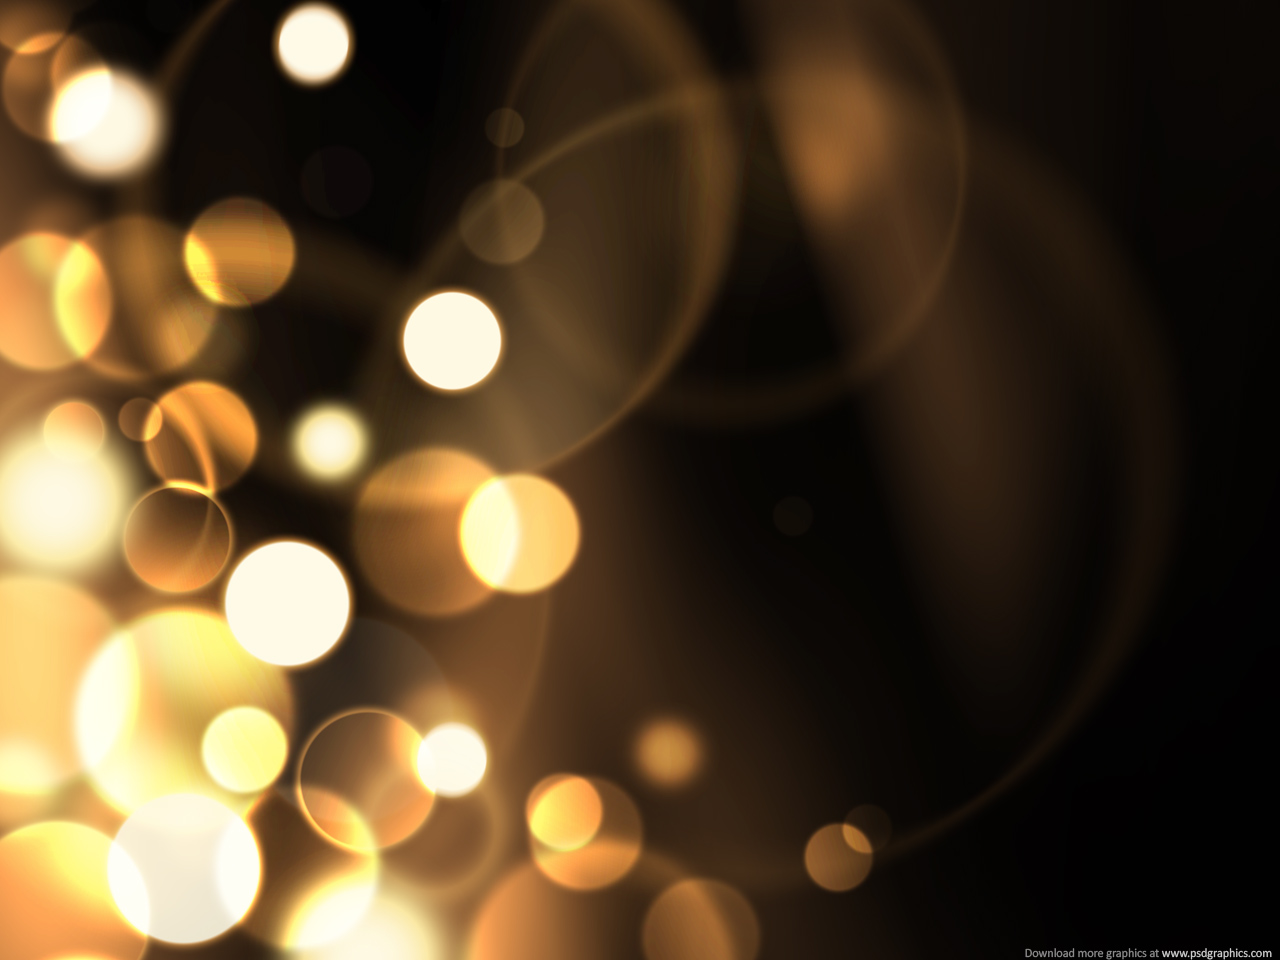 12 Sparkles PSDGraphics Backgrounds Images